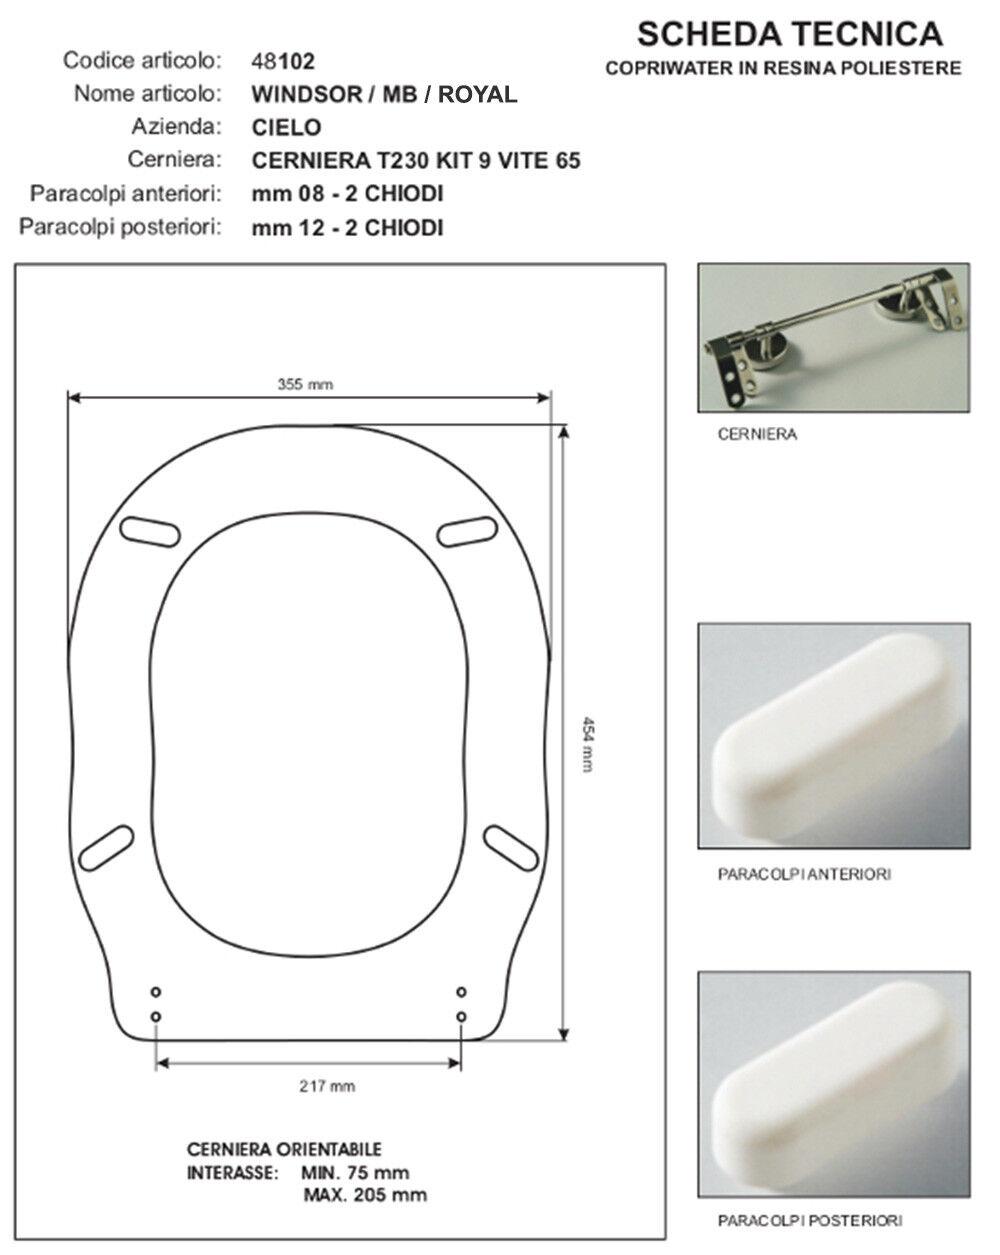 WC Sitz Toilettensitze series kompatibel Royal Windsor - Hersteller Hersteller Hersteller Eos bbeea1